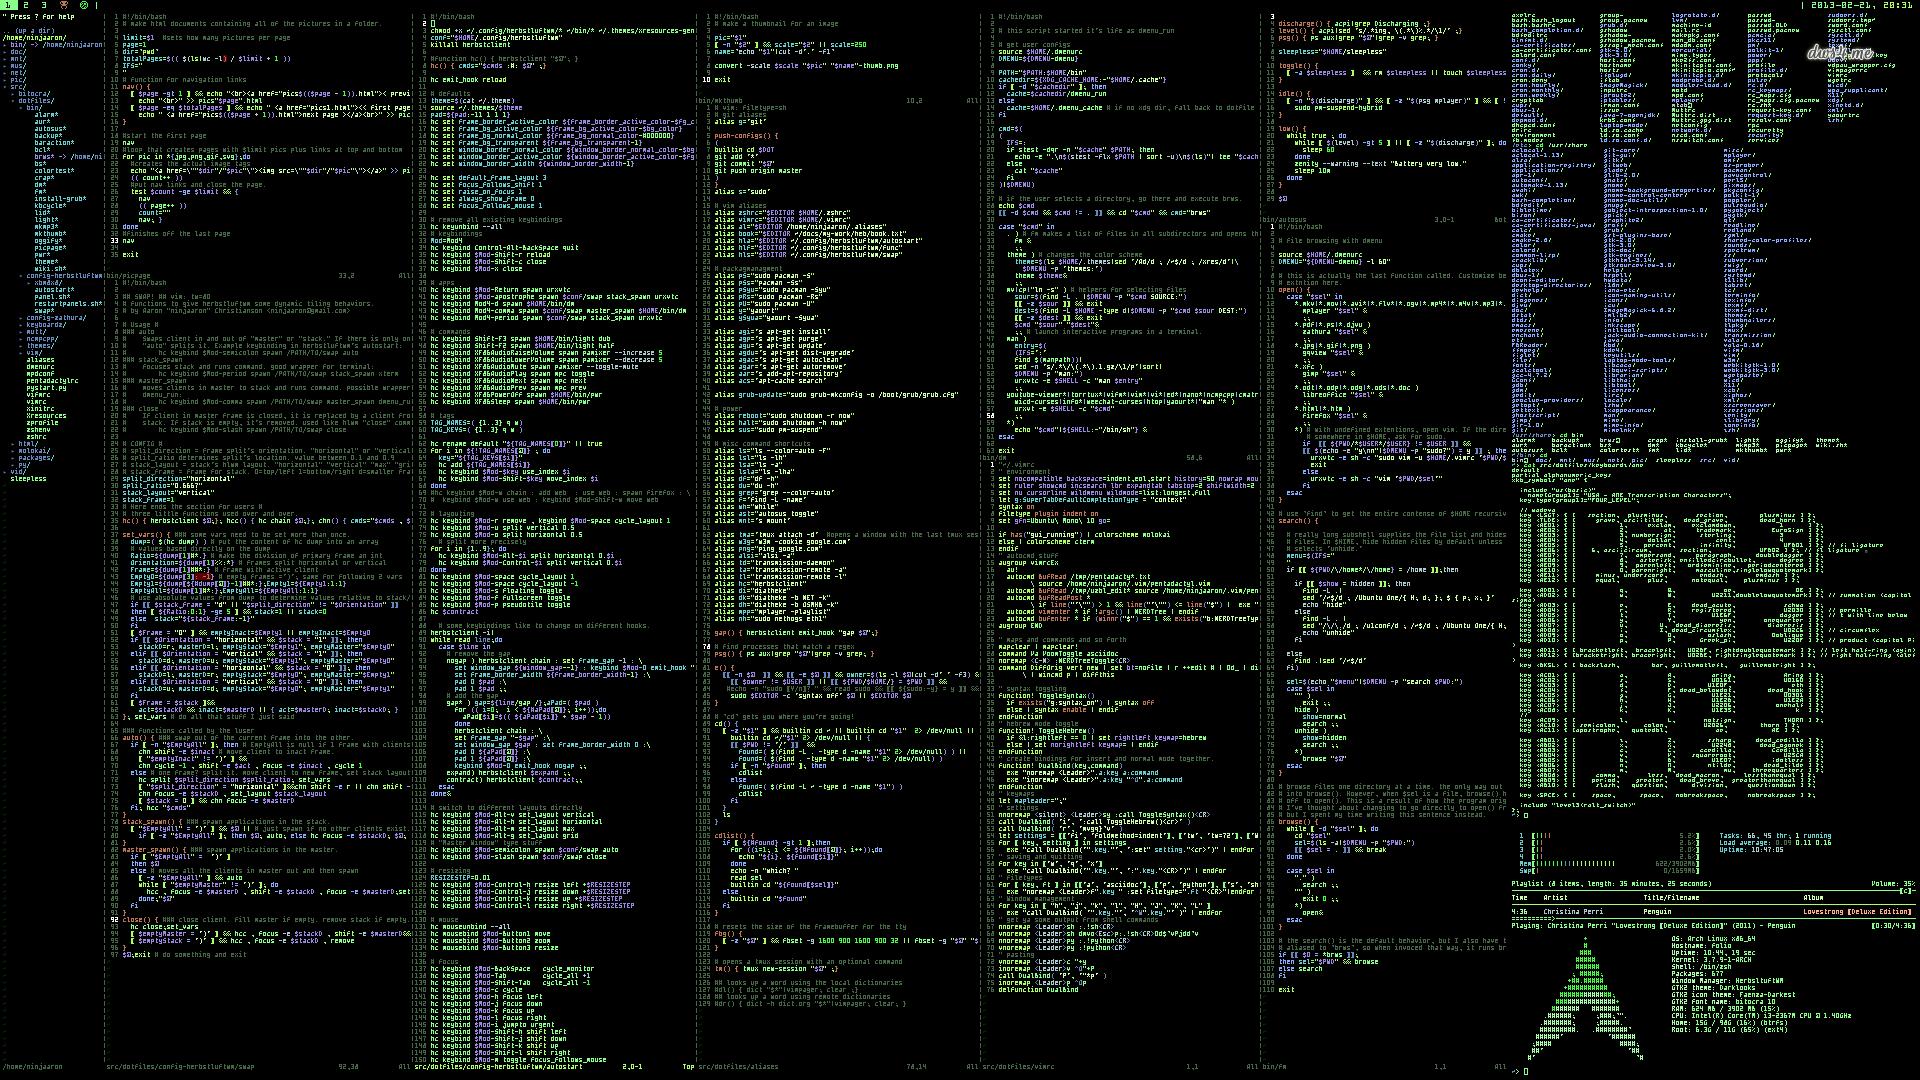 Linux Commands Hd Wallpaper System Wallpaper Lines Wallpaper Desktop Wallpaper 1920x1080